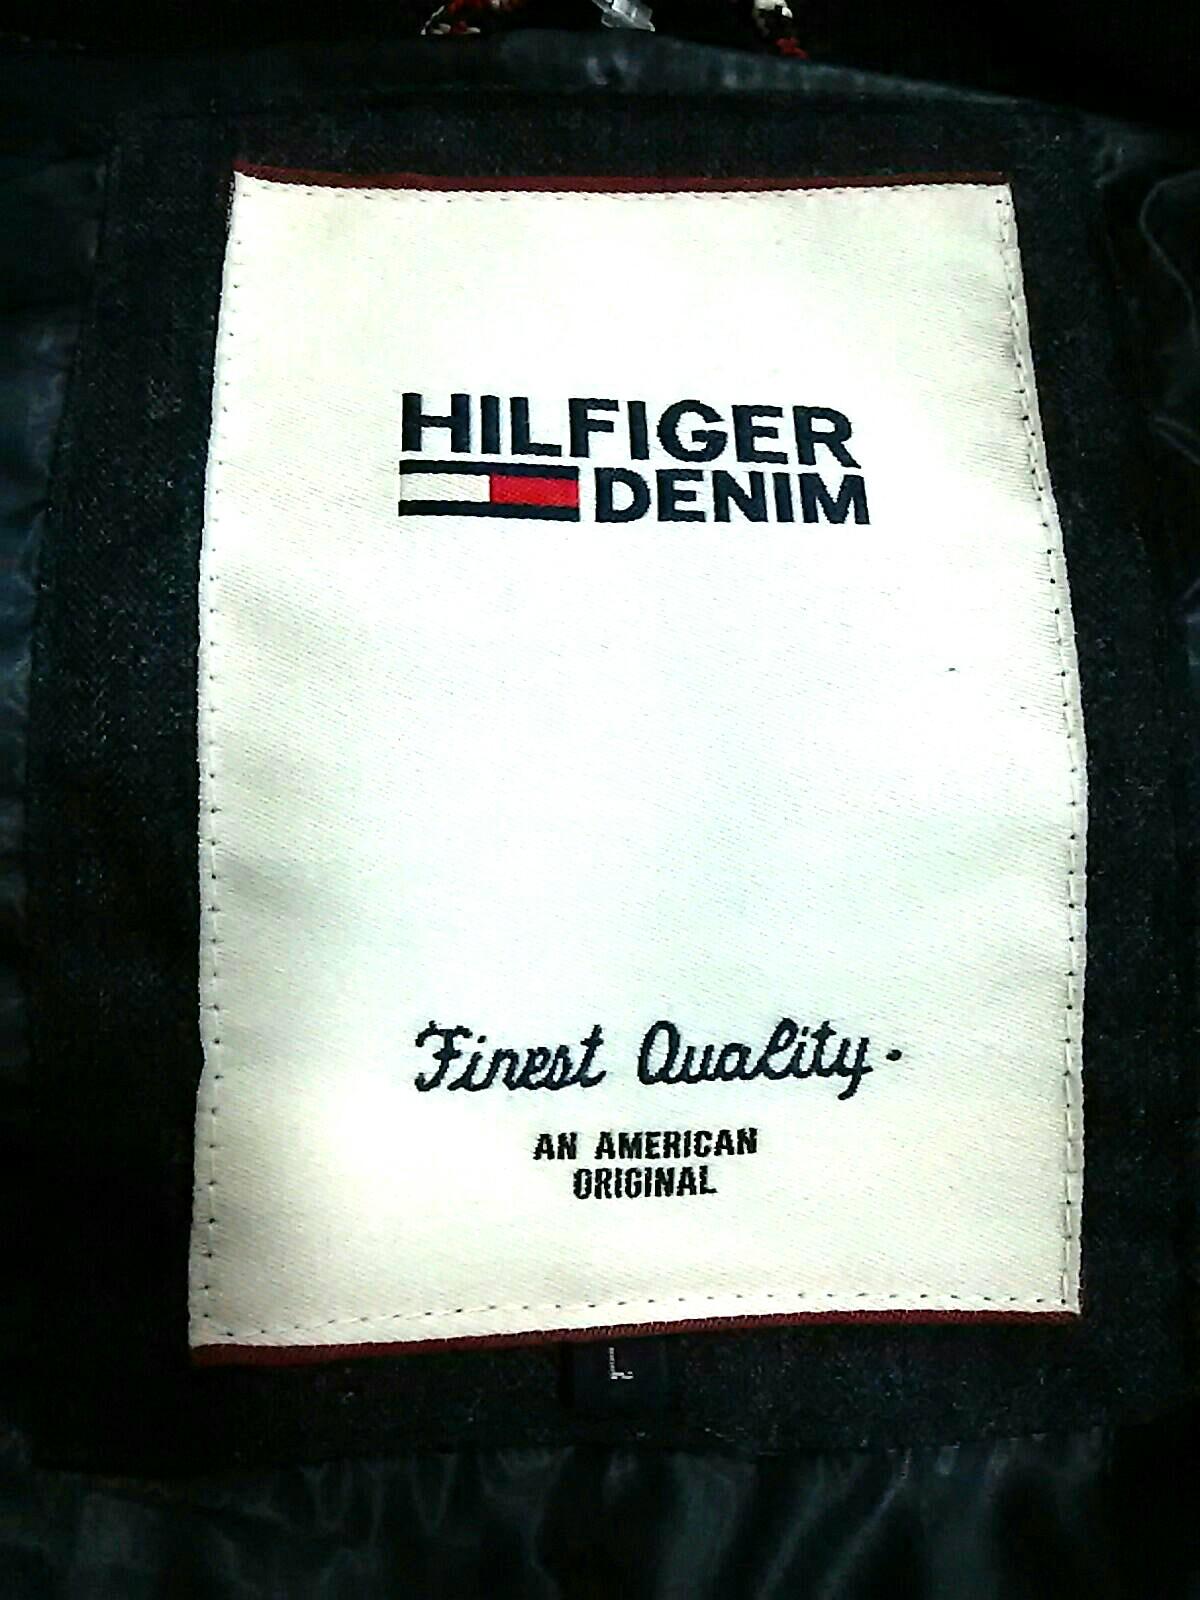 HILFIGER DENIM(ヒルフィガーデニム)のダウンベスト